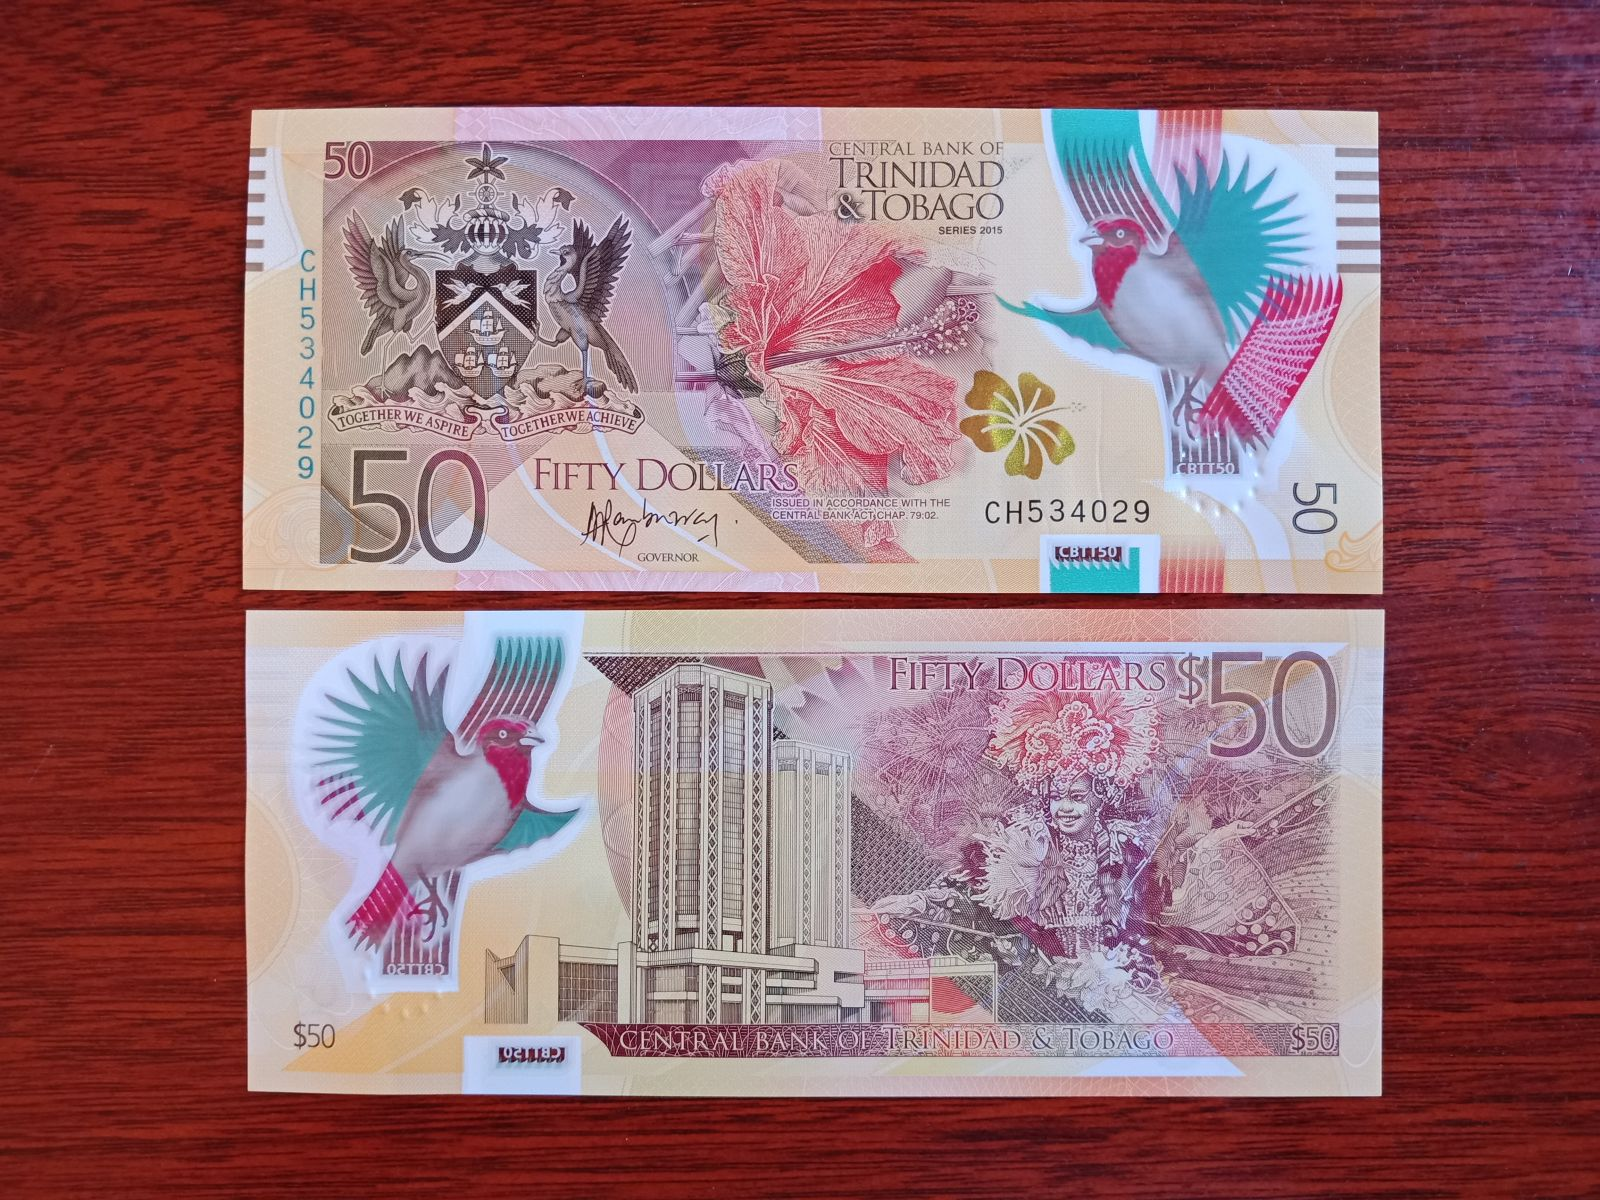 50 Dollars Trinidad & Tobago Polymer 2015